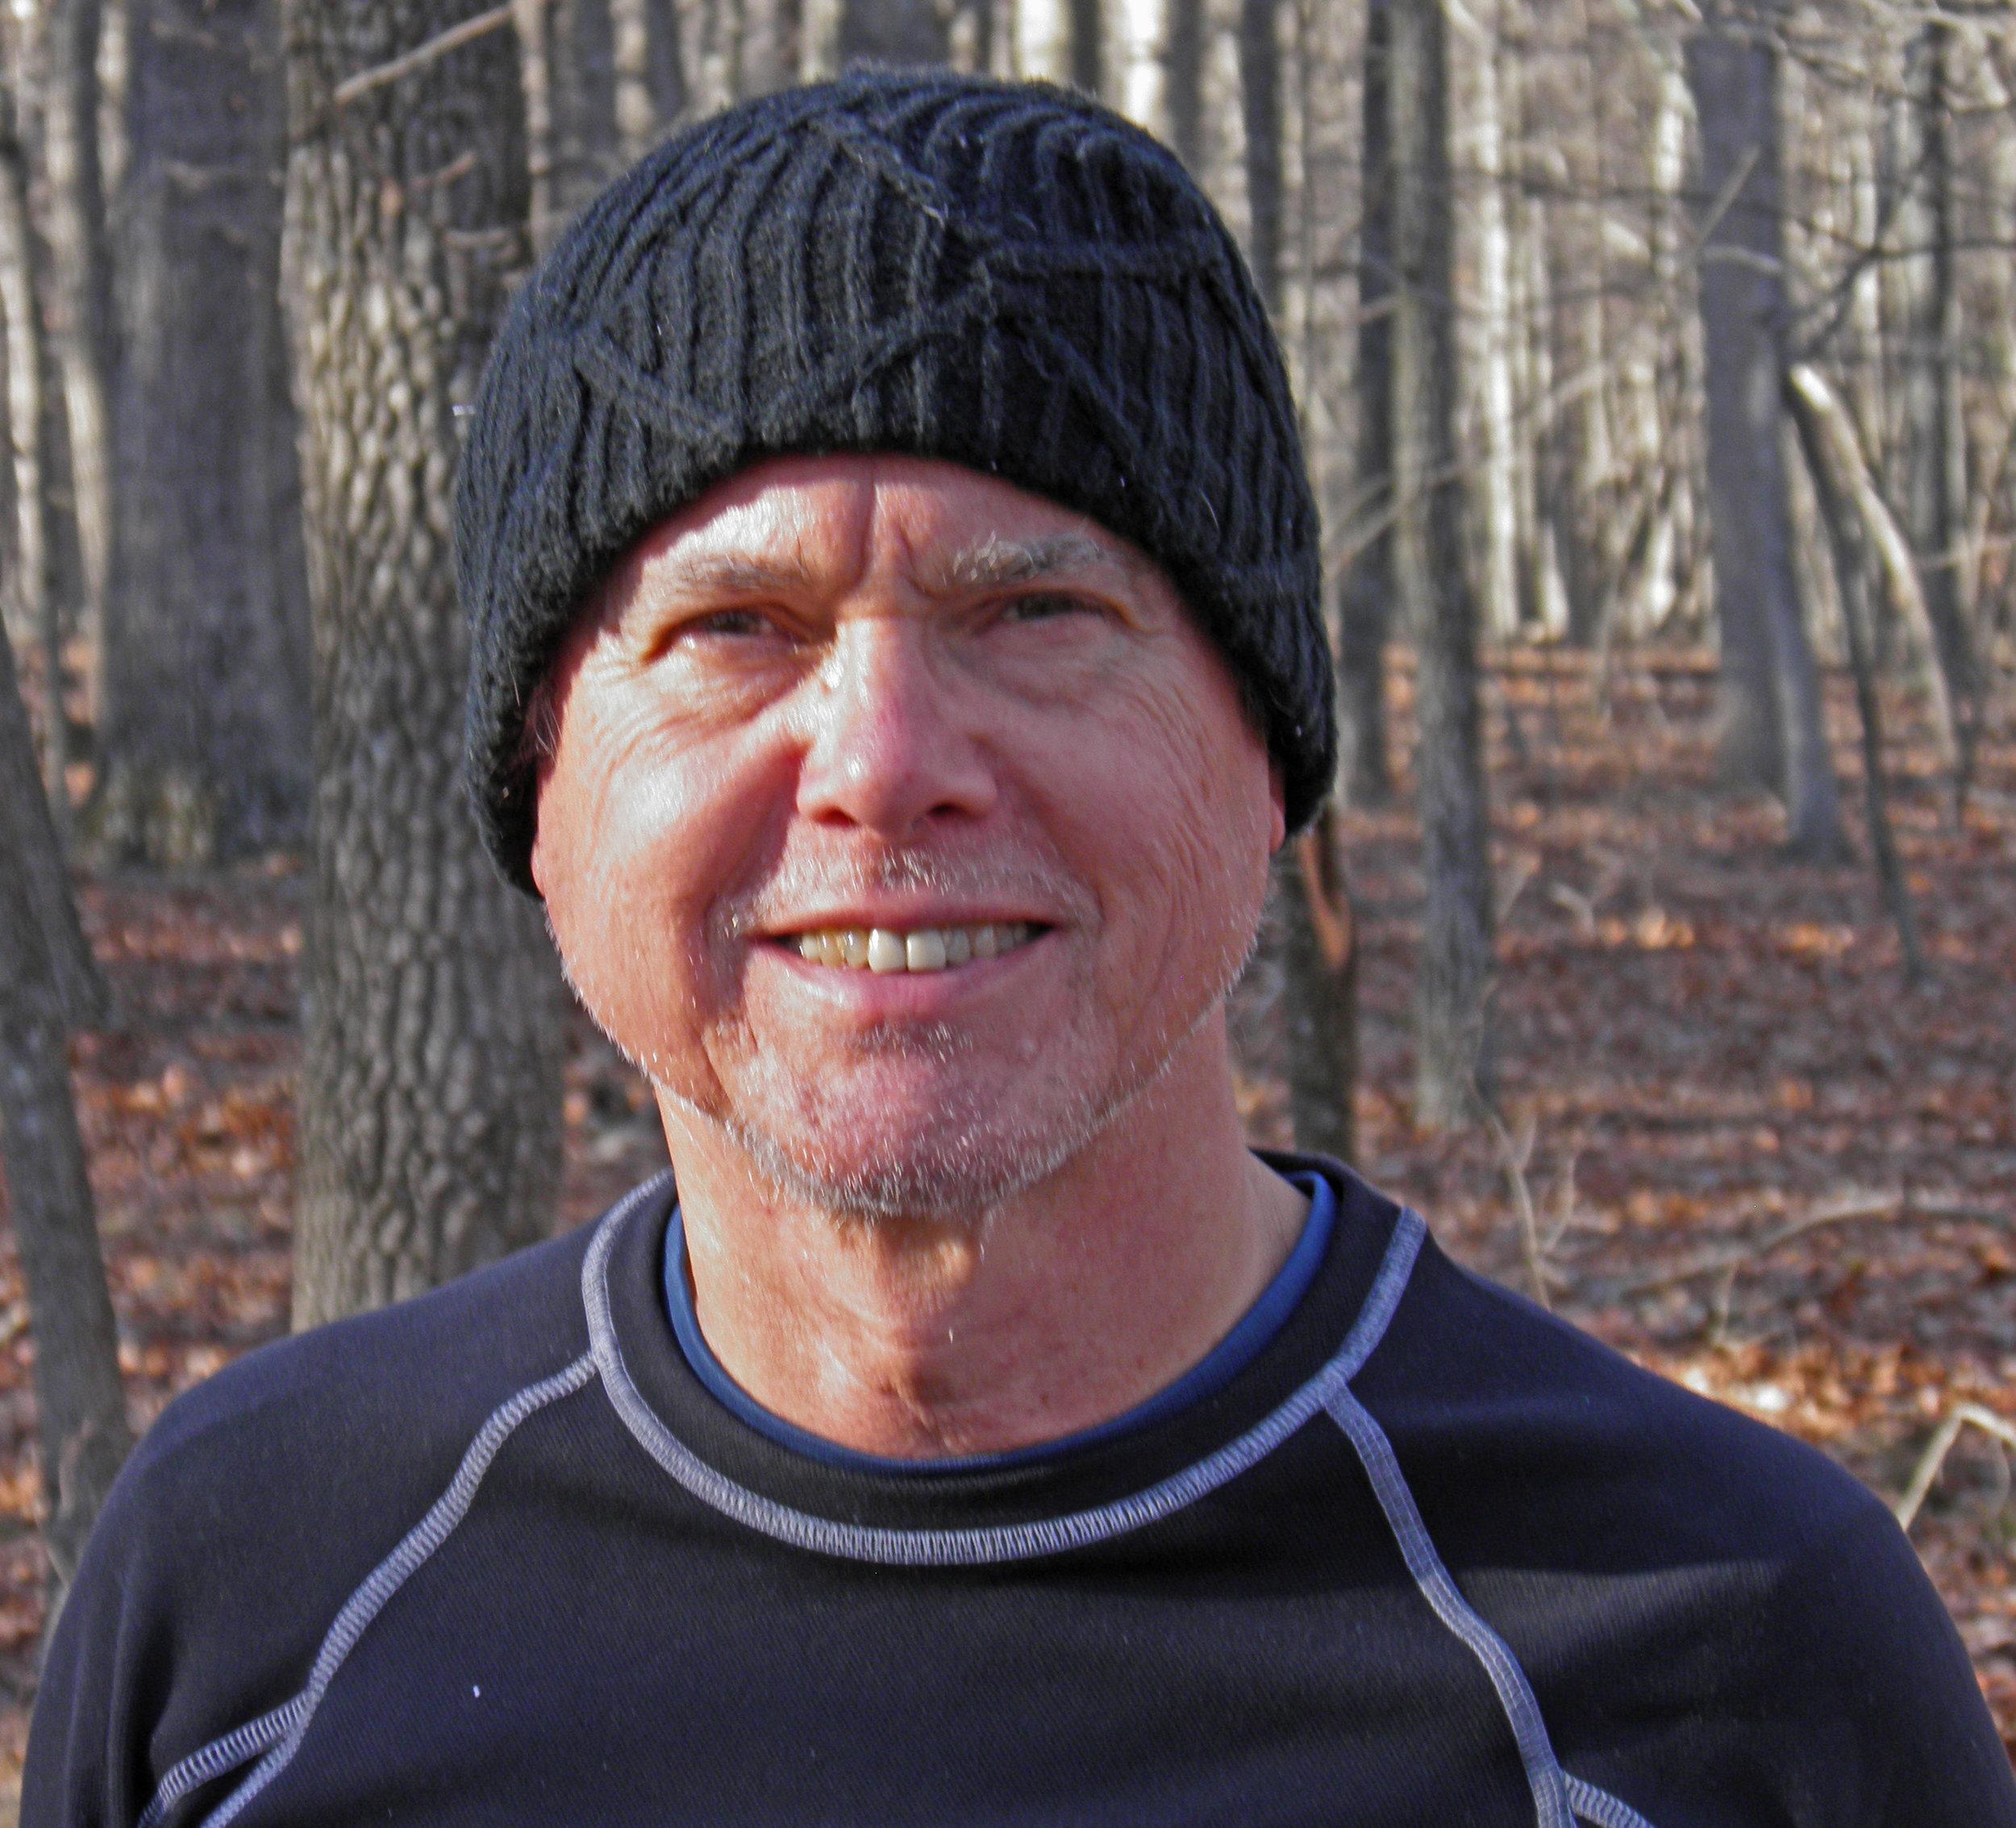 Jim photo woods res.jpg